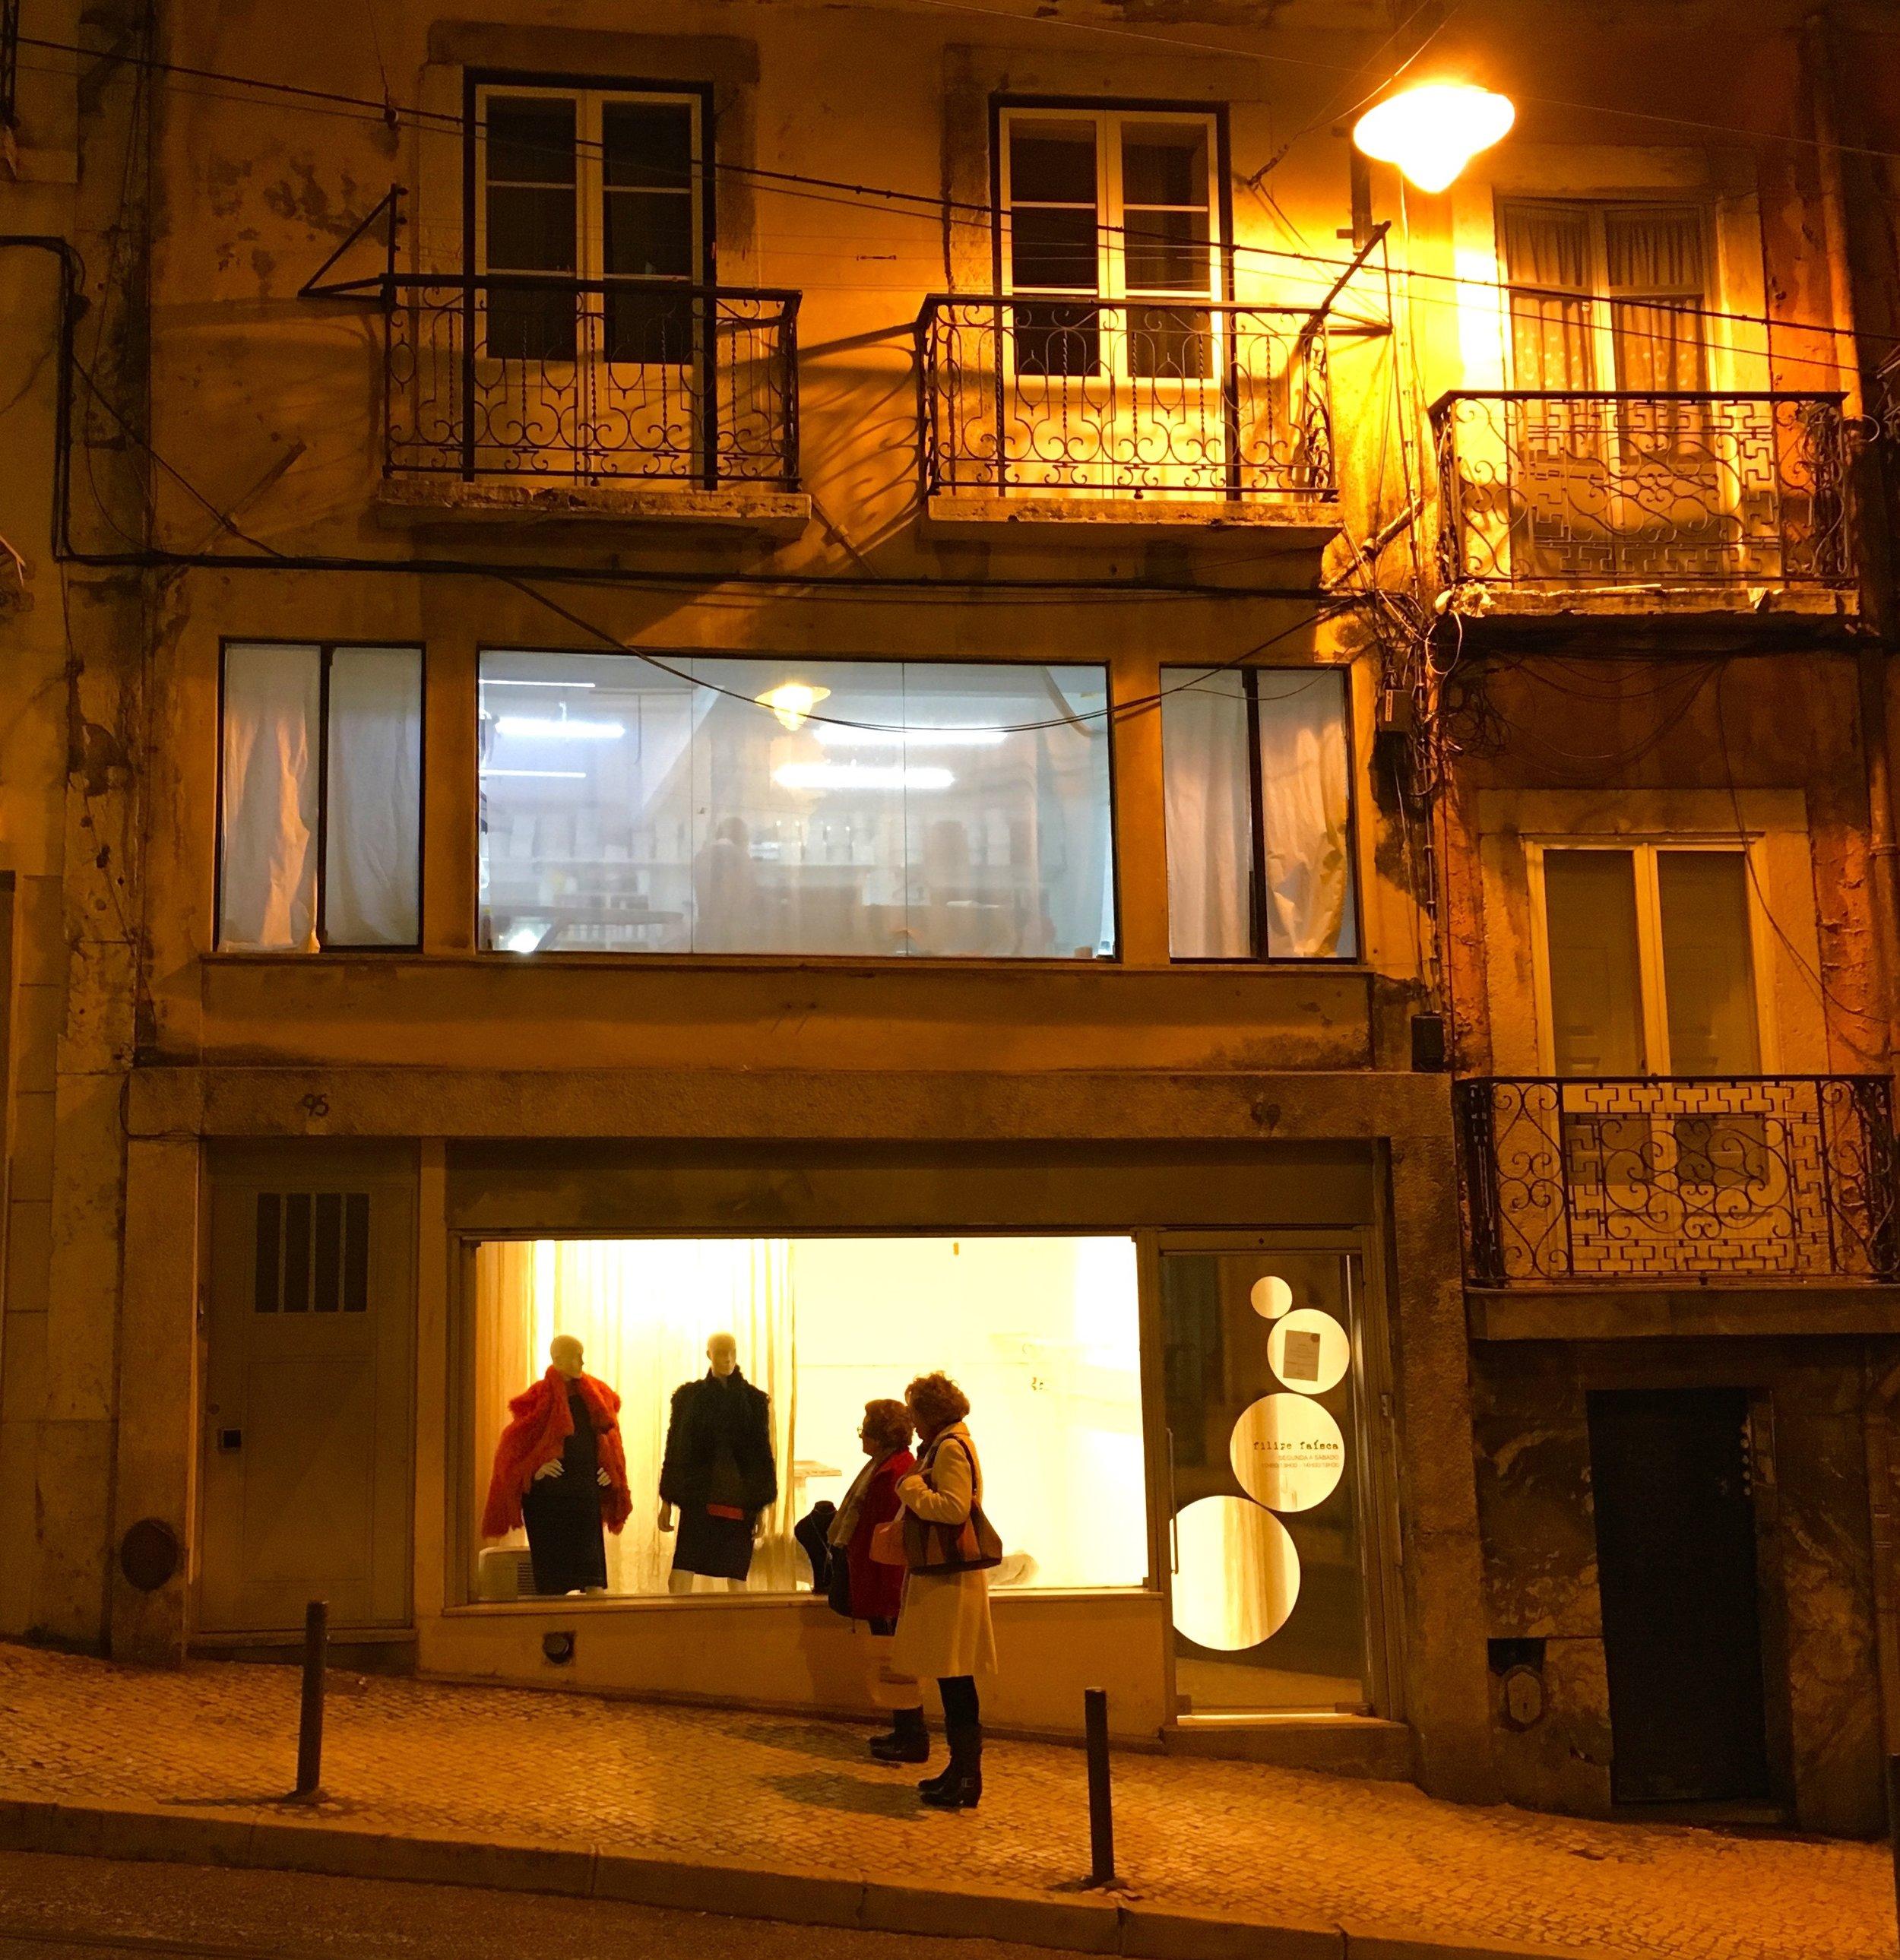 Walking up Calçada do Combro, Lisbon